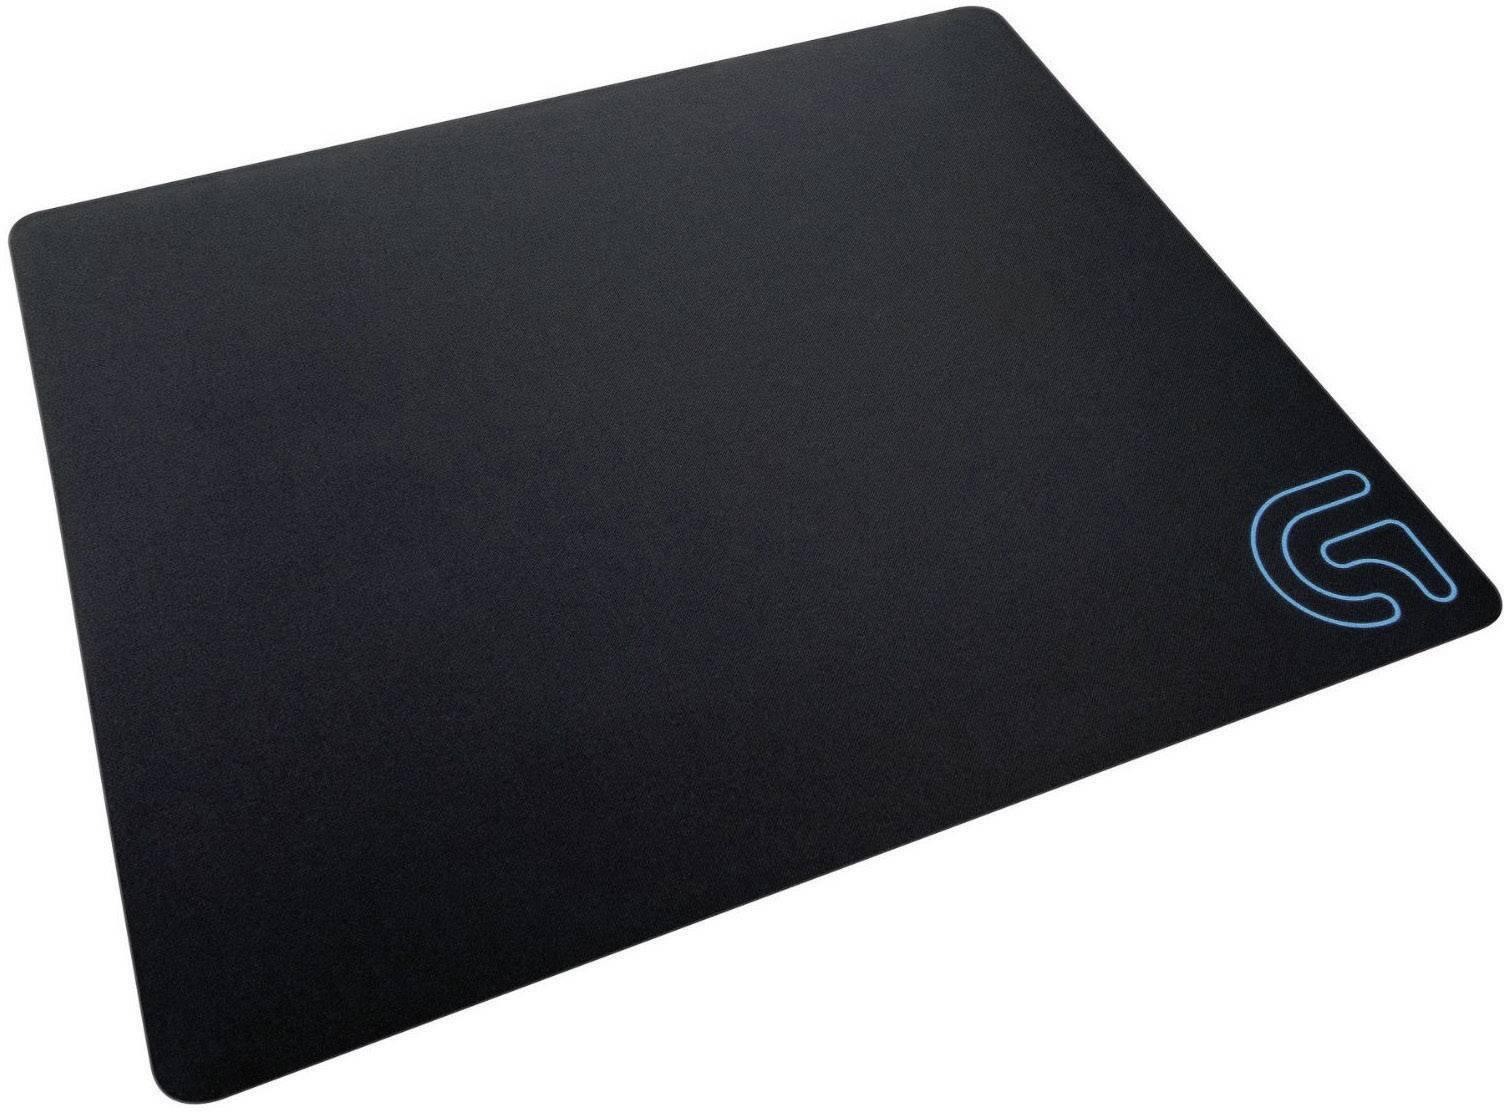 Herná podložka pod myš Logitech Gaming G240, 340 x 1 x 280, čierna